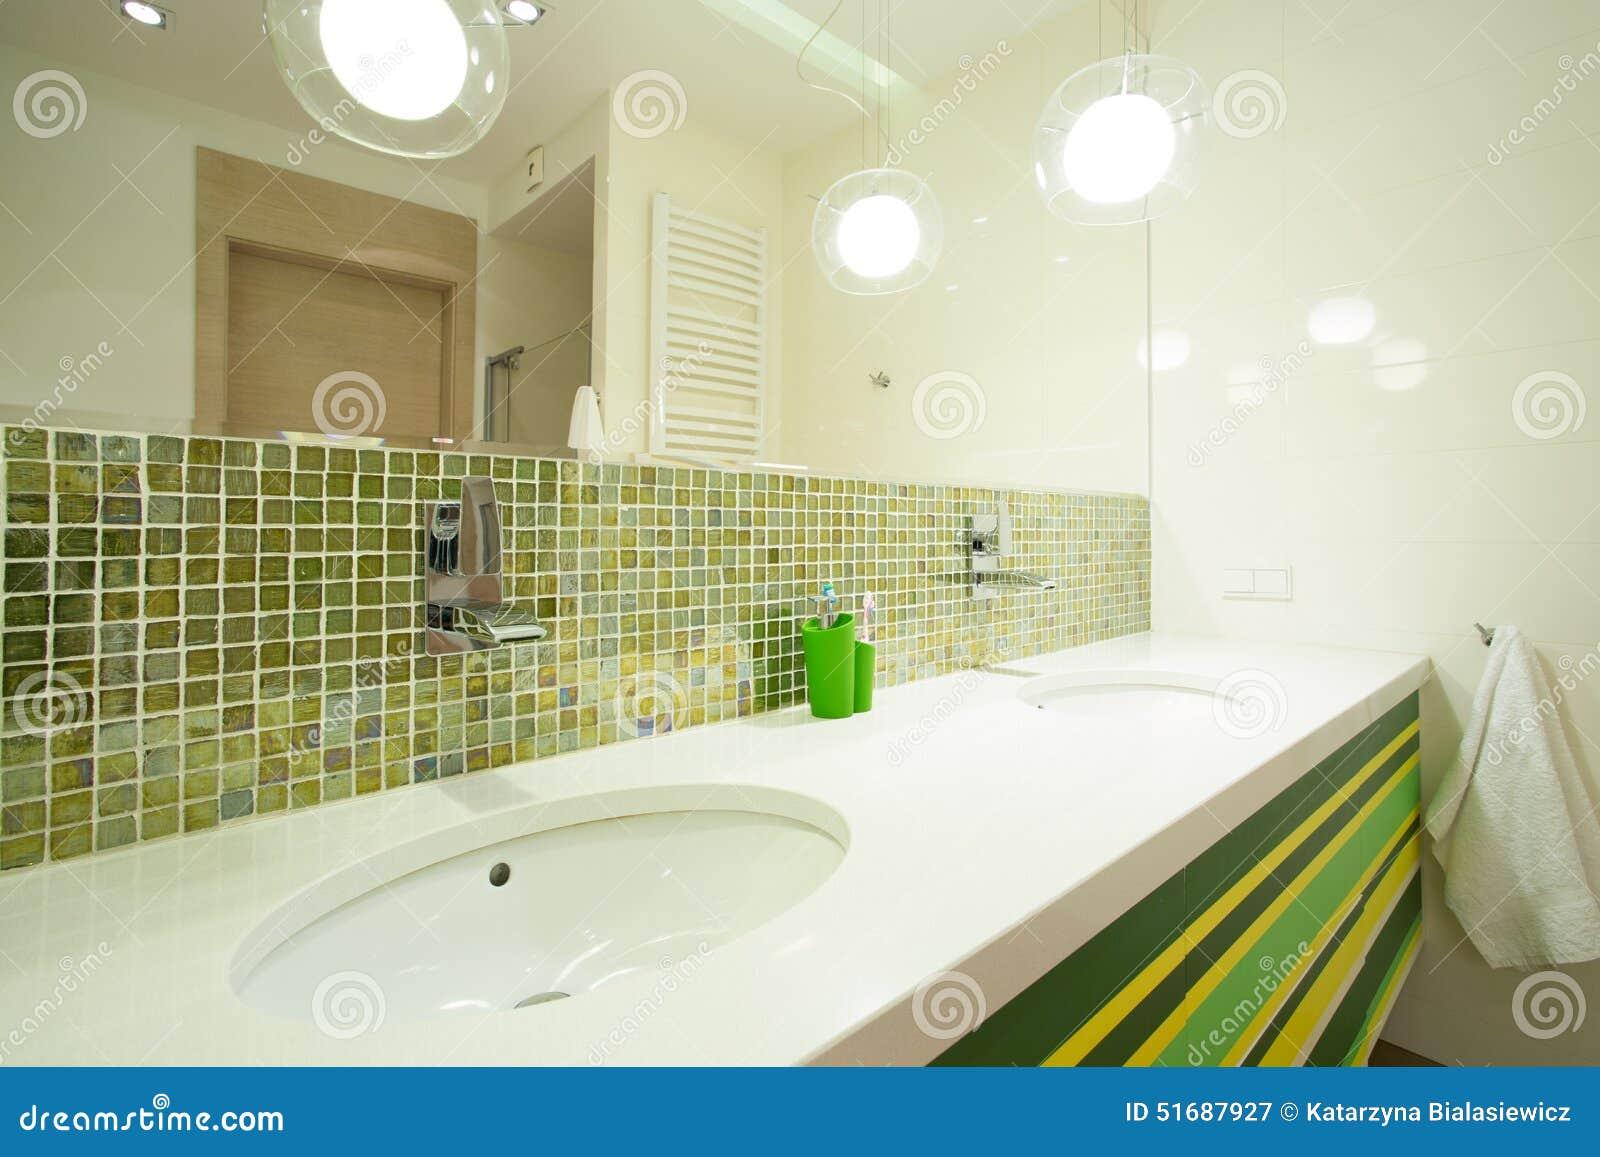 Mattonelle Bagno Verde Acqua : Piastrelle bagno verdi. best mattonelle cucina leroy merlin